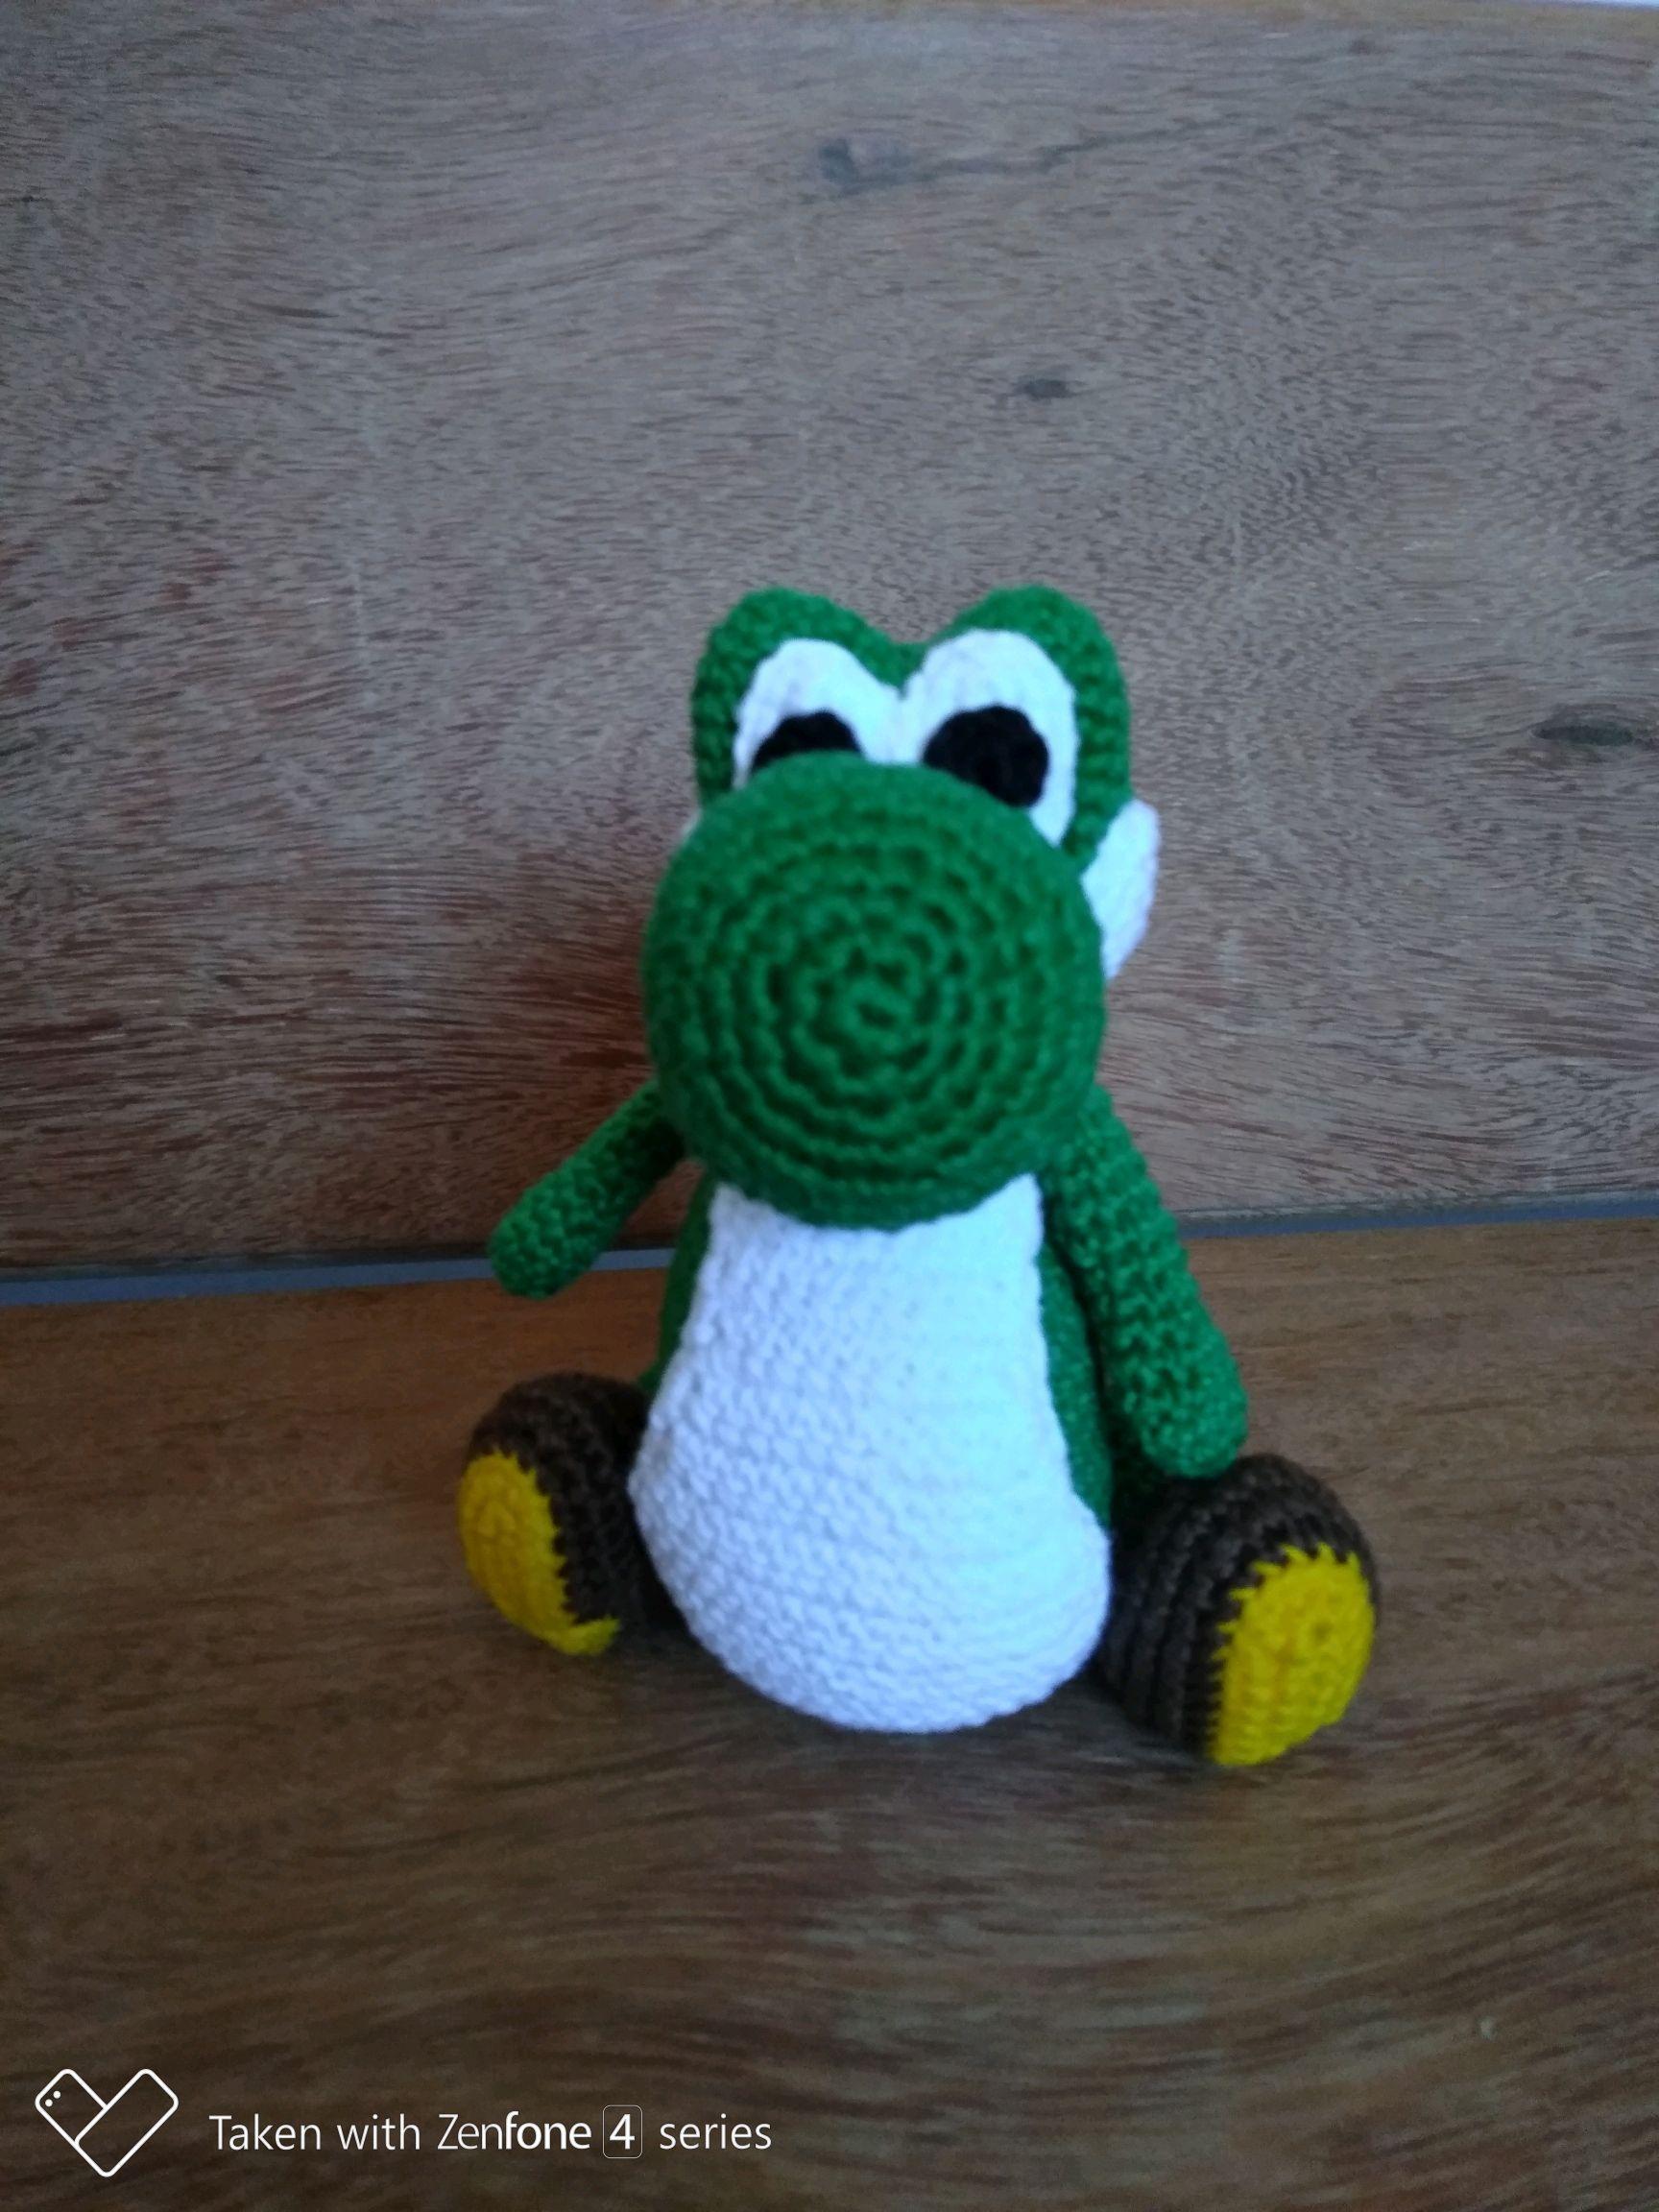 yoshi__crochet__by_sirpurlgrey-d7mqqmx.jpg 1.288×1.288 pixel (mit ... | 2304x1728